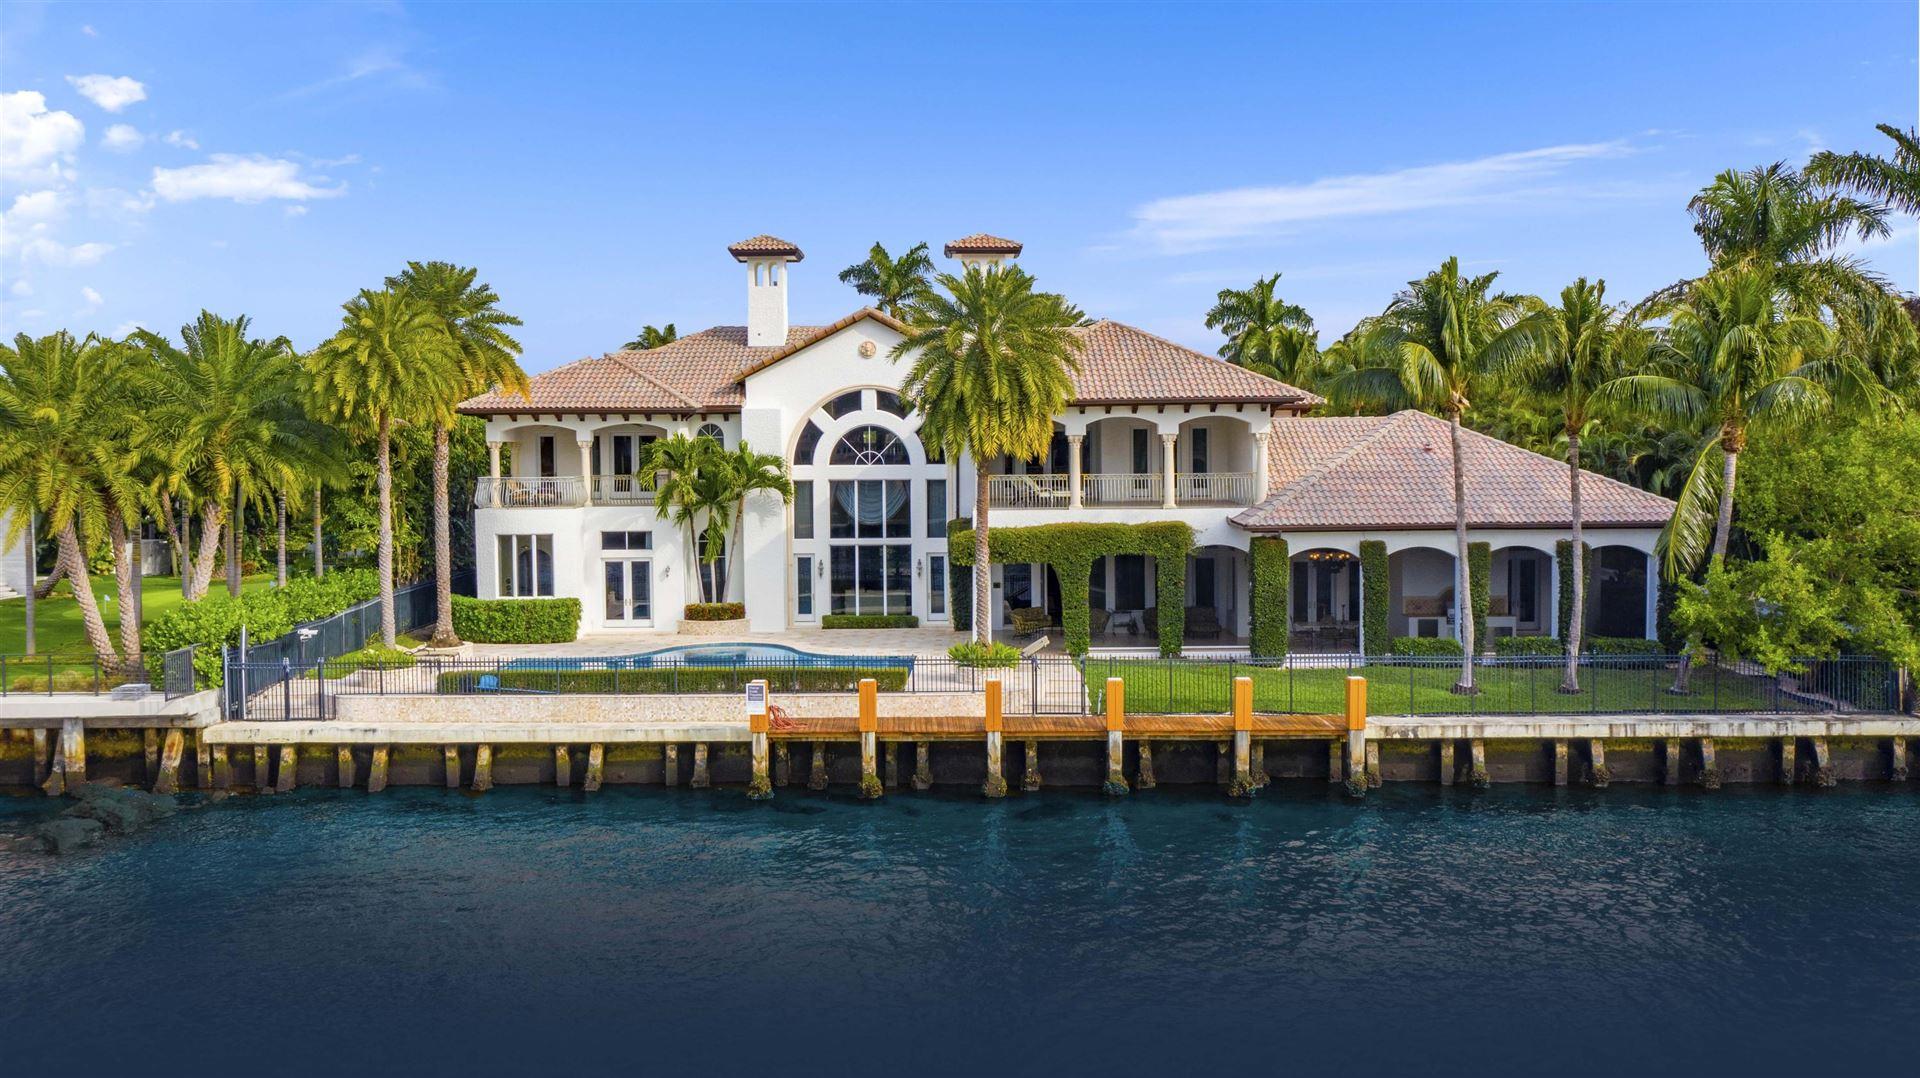 1261 Spanish River Road, Boca Raton, FL 33432 - MLS#: RX-10683043